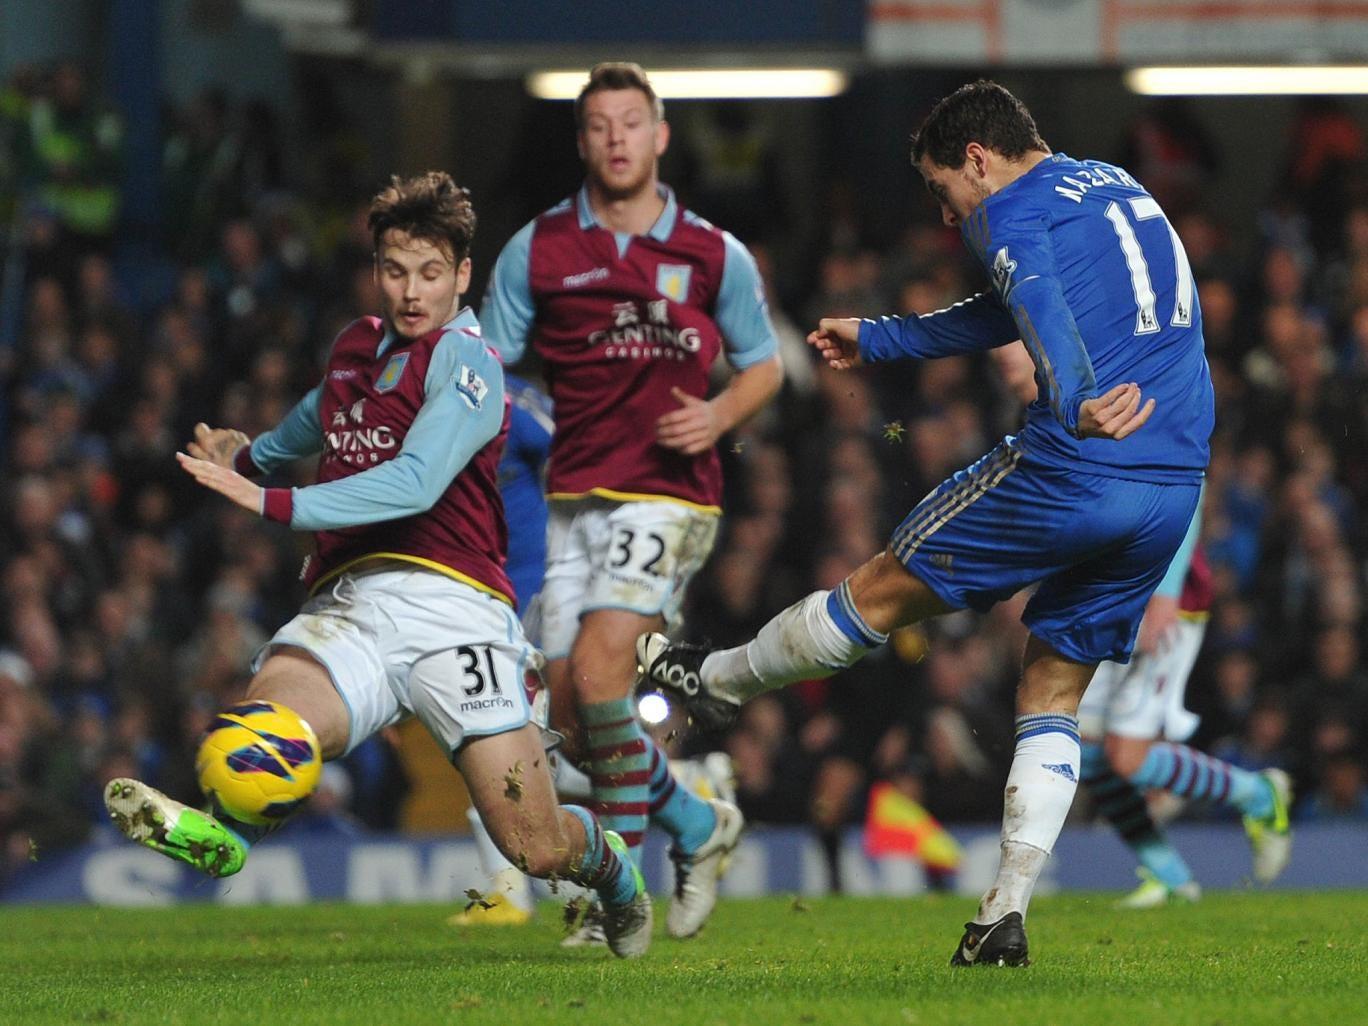 Chelsea's Belgian midfielder Eden Hazard (R) scores their seventh goal past Aston Villa's Australian midfielder Chris Herd